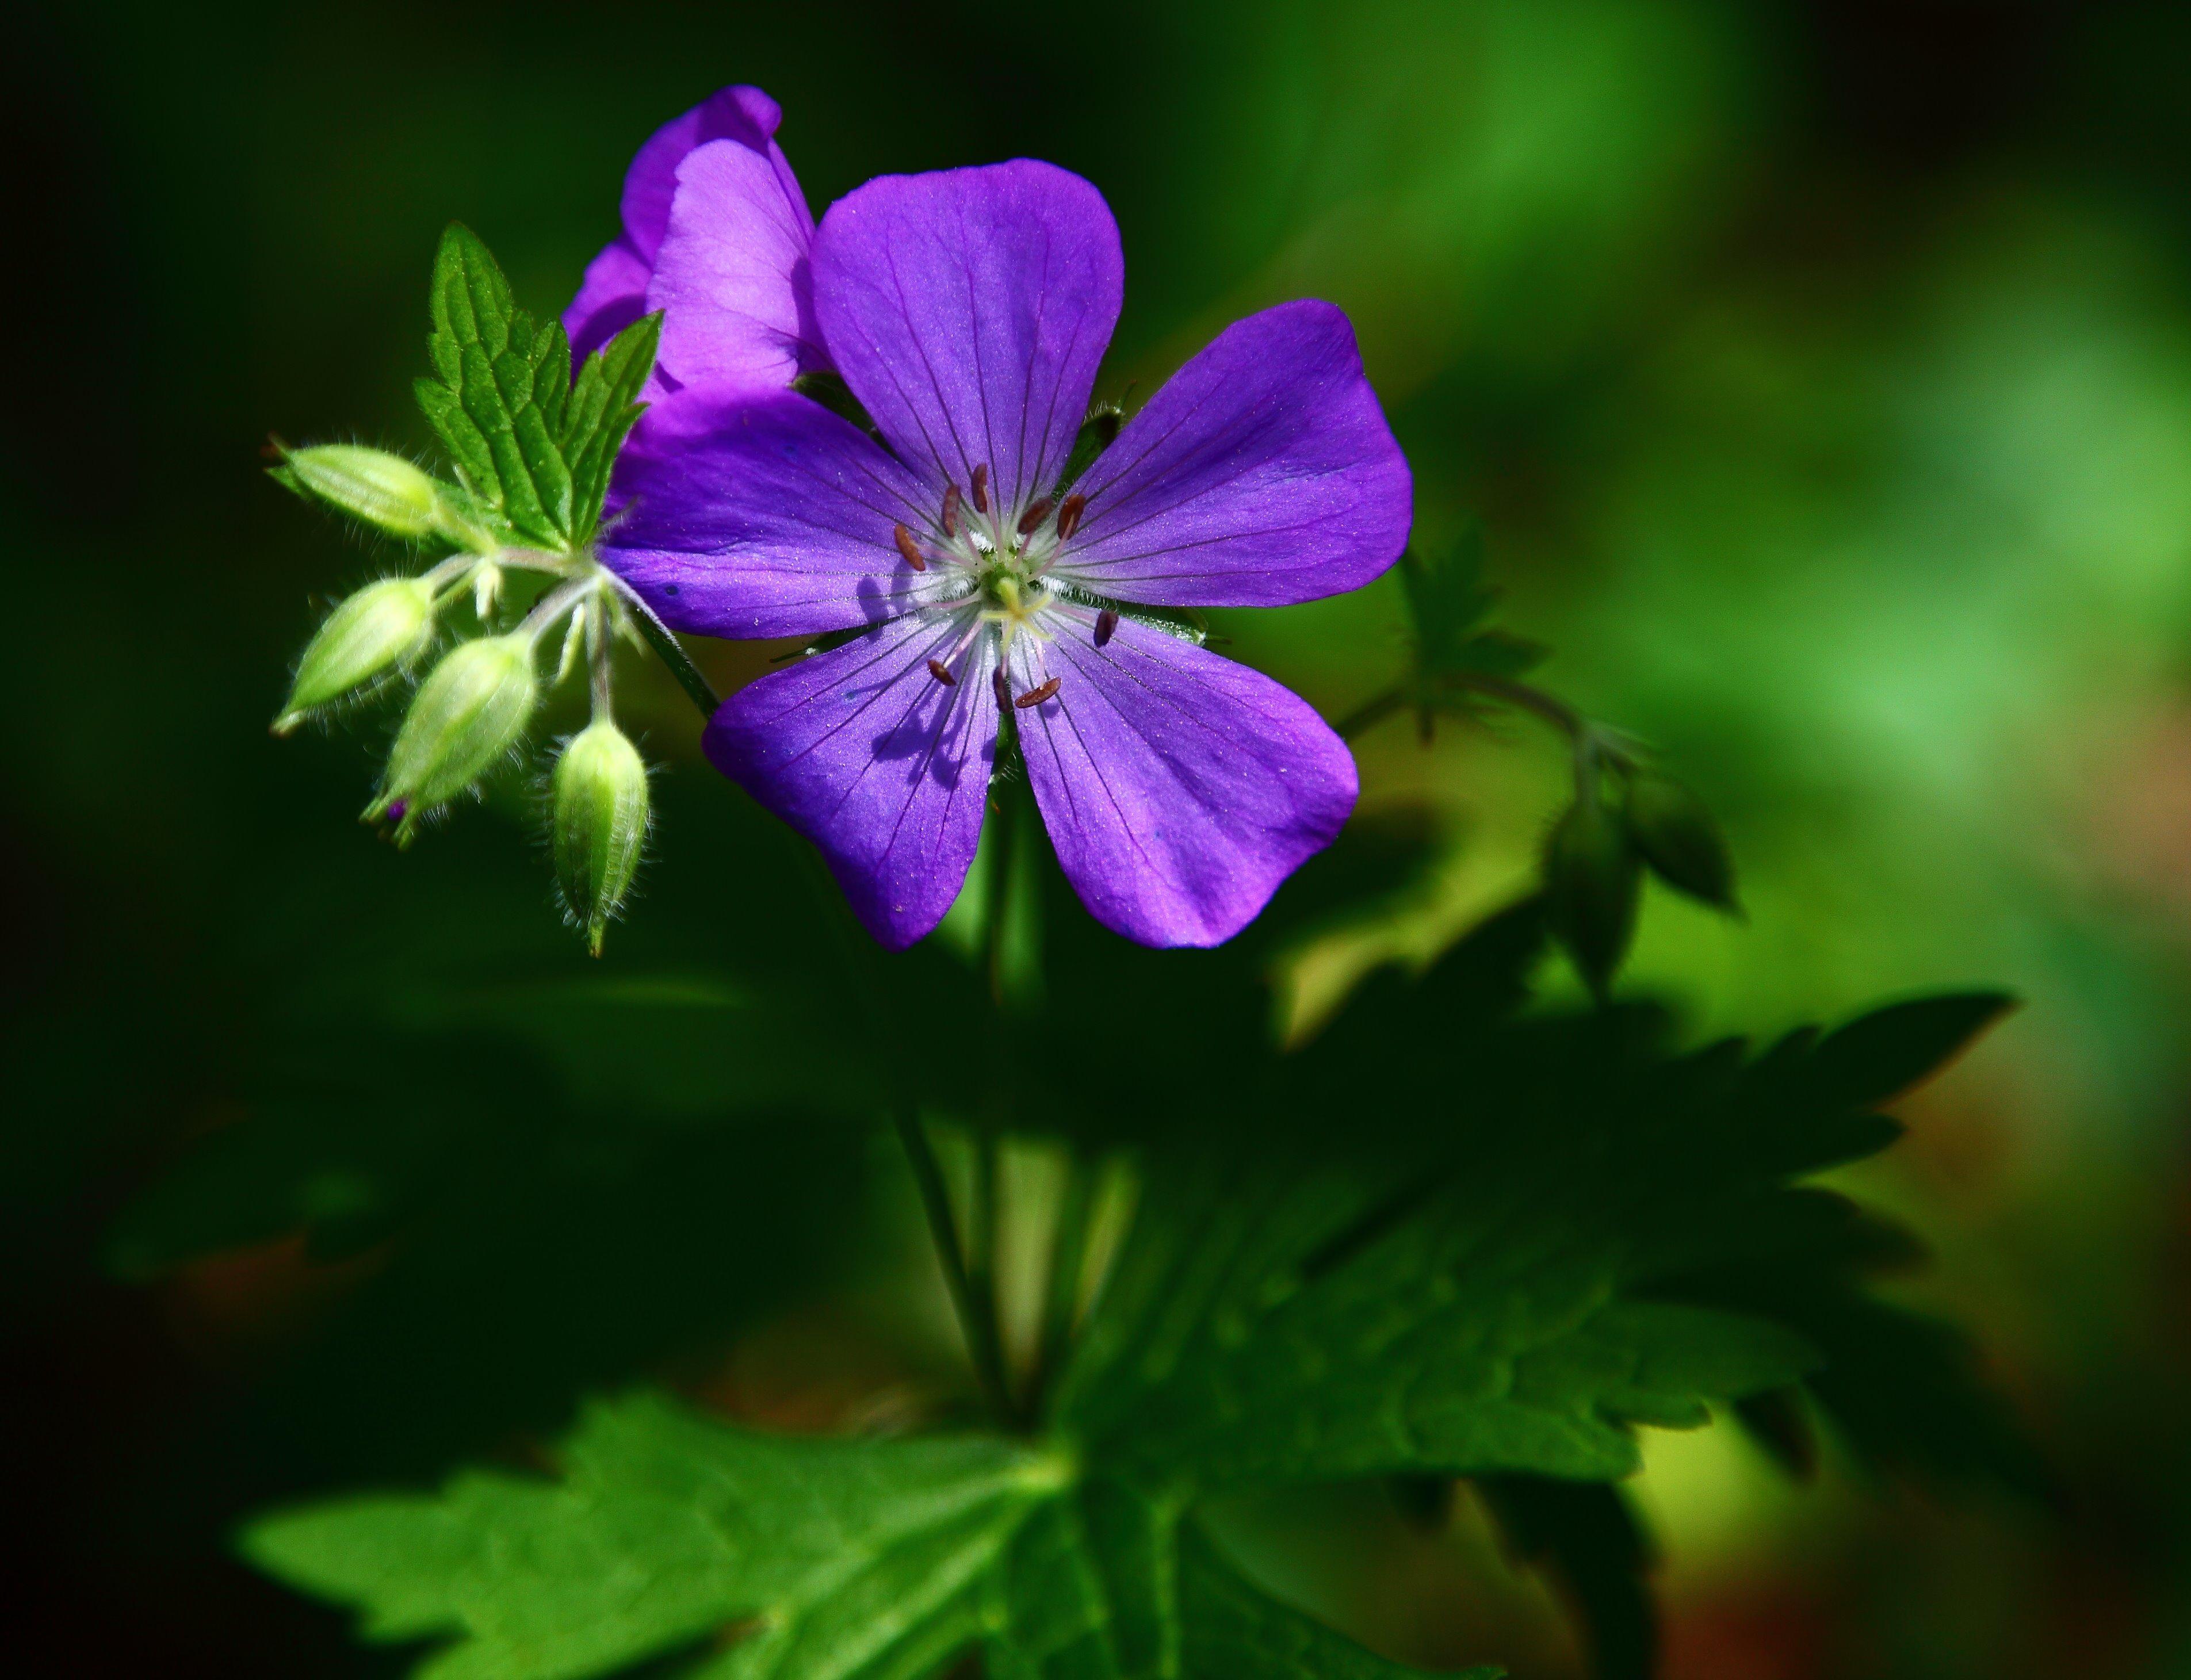 Filesmall blue forest flower virginia forestwanderg filesmall blue forest flower virginia forestwanderg izmirmasajfo